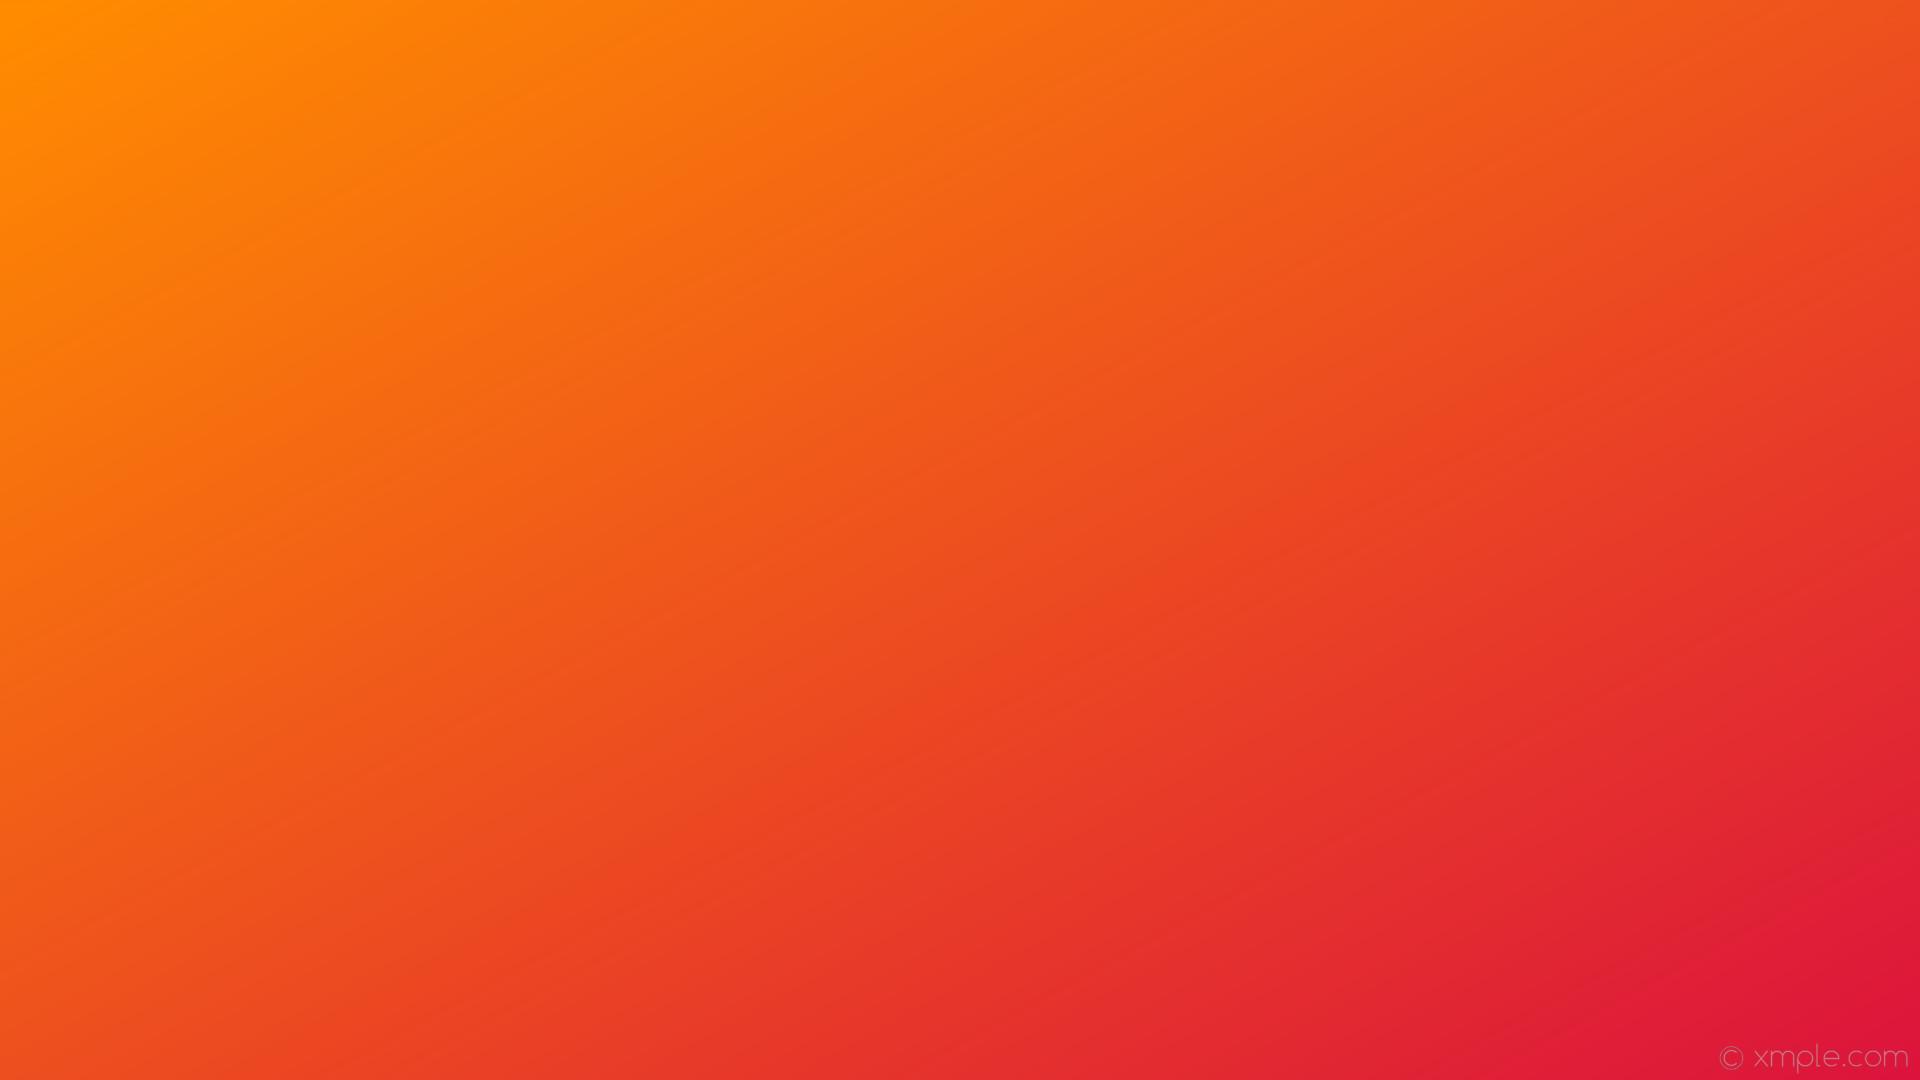 wallpaper orange gradient linear red dark orange crimson #ff8c00 #dc143c  150°